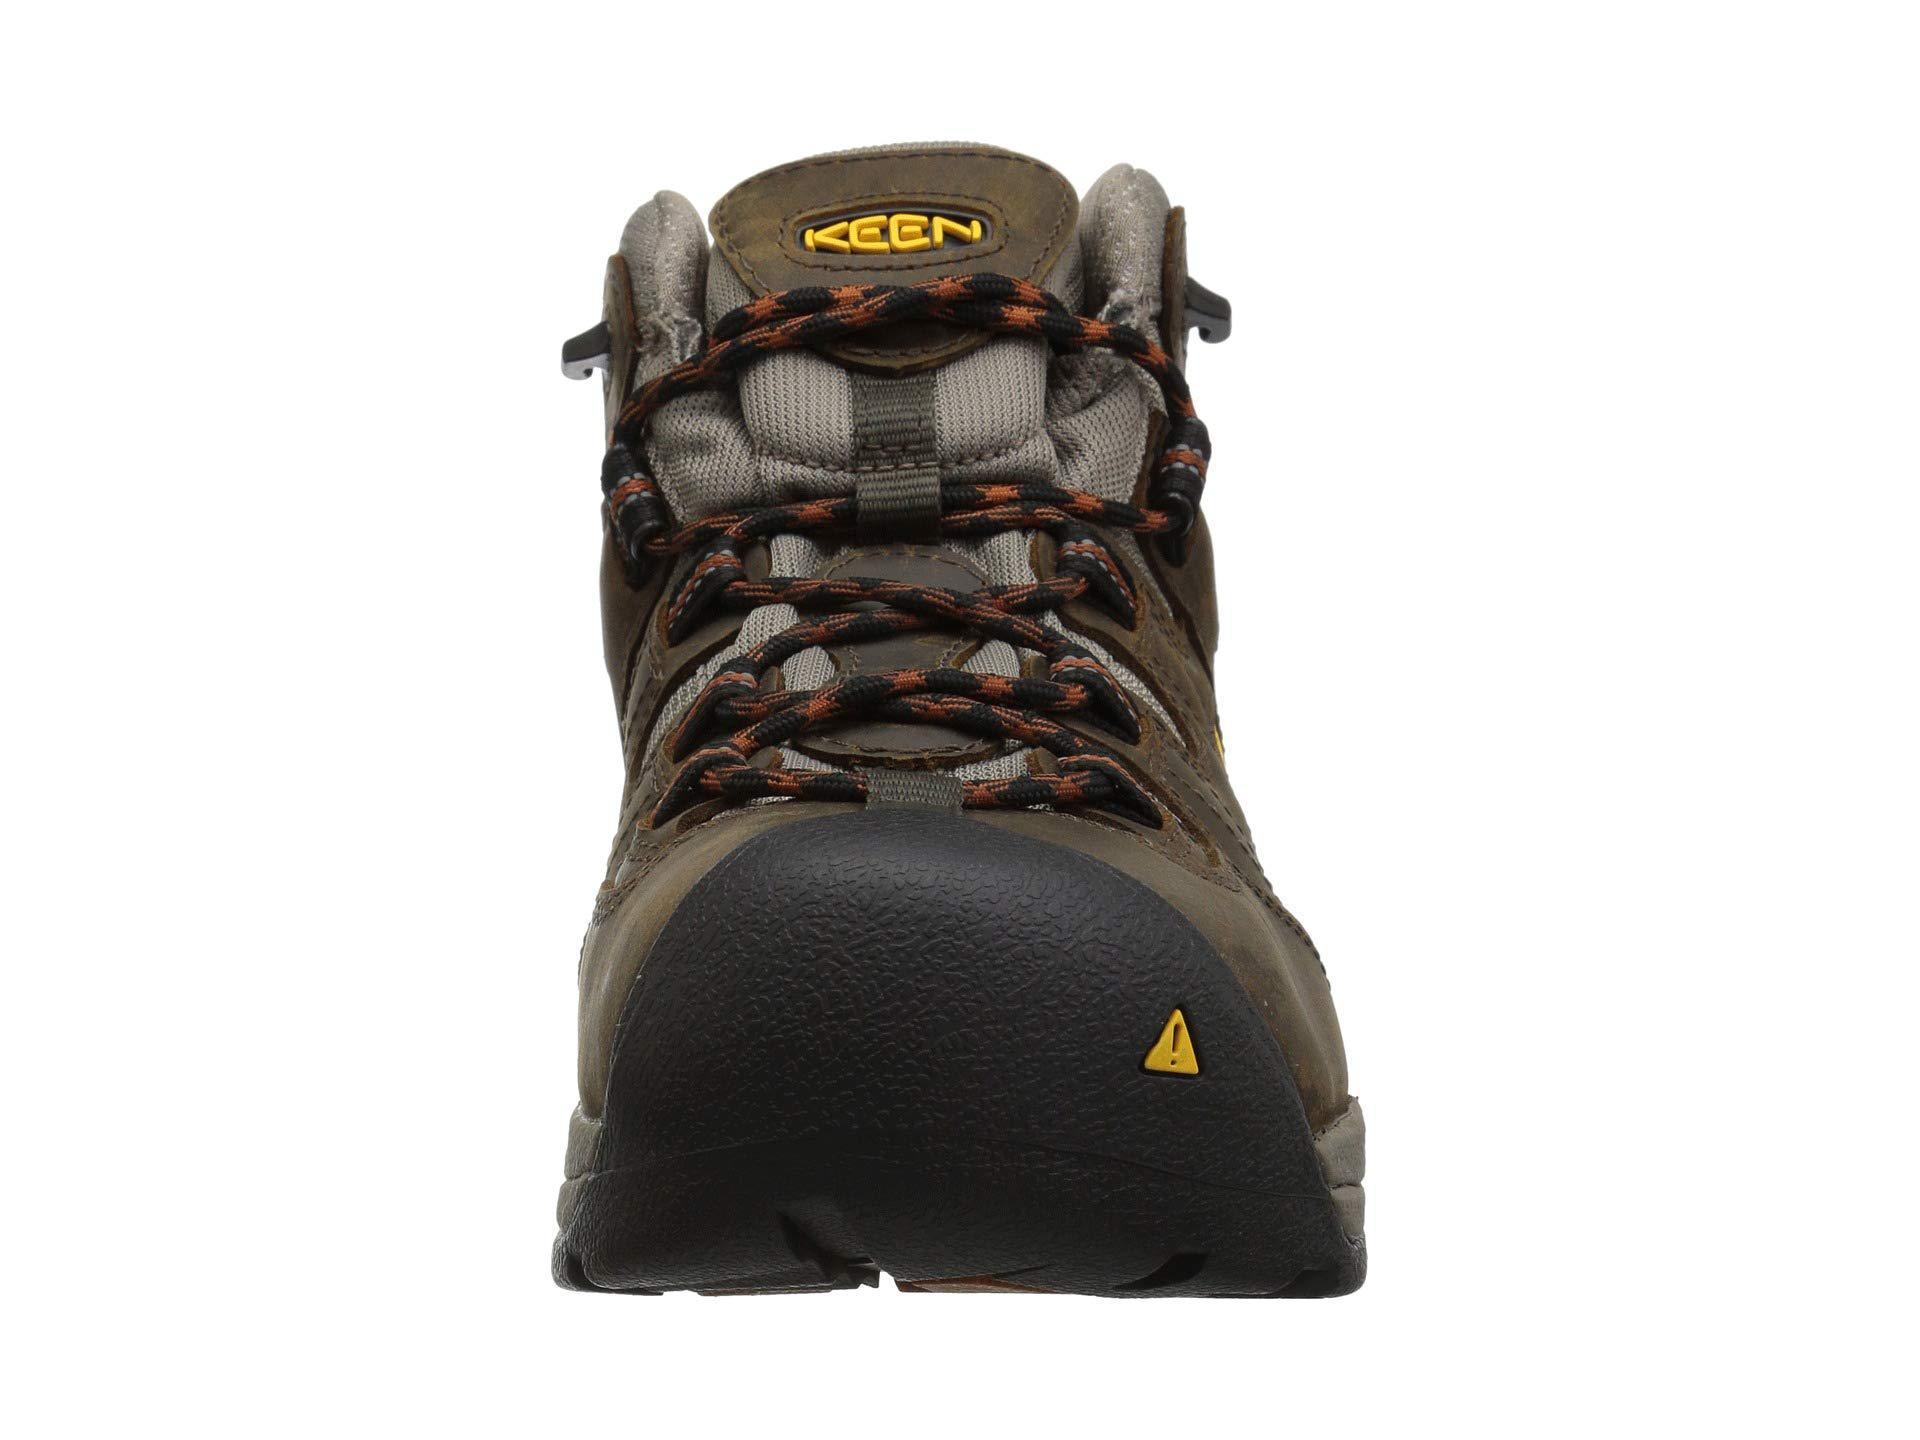 8e3ae5a8996 Lyst - Keen Utility Detroit Xt Mid Soft Toe Waterproof Work Boot in ...